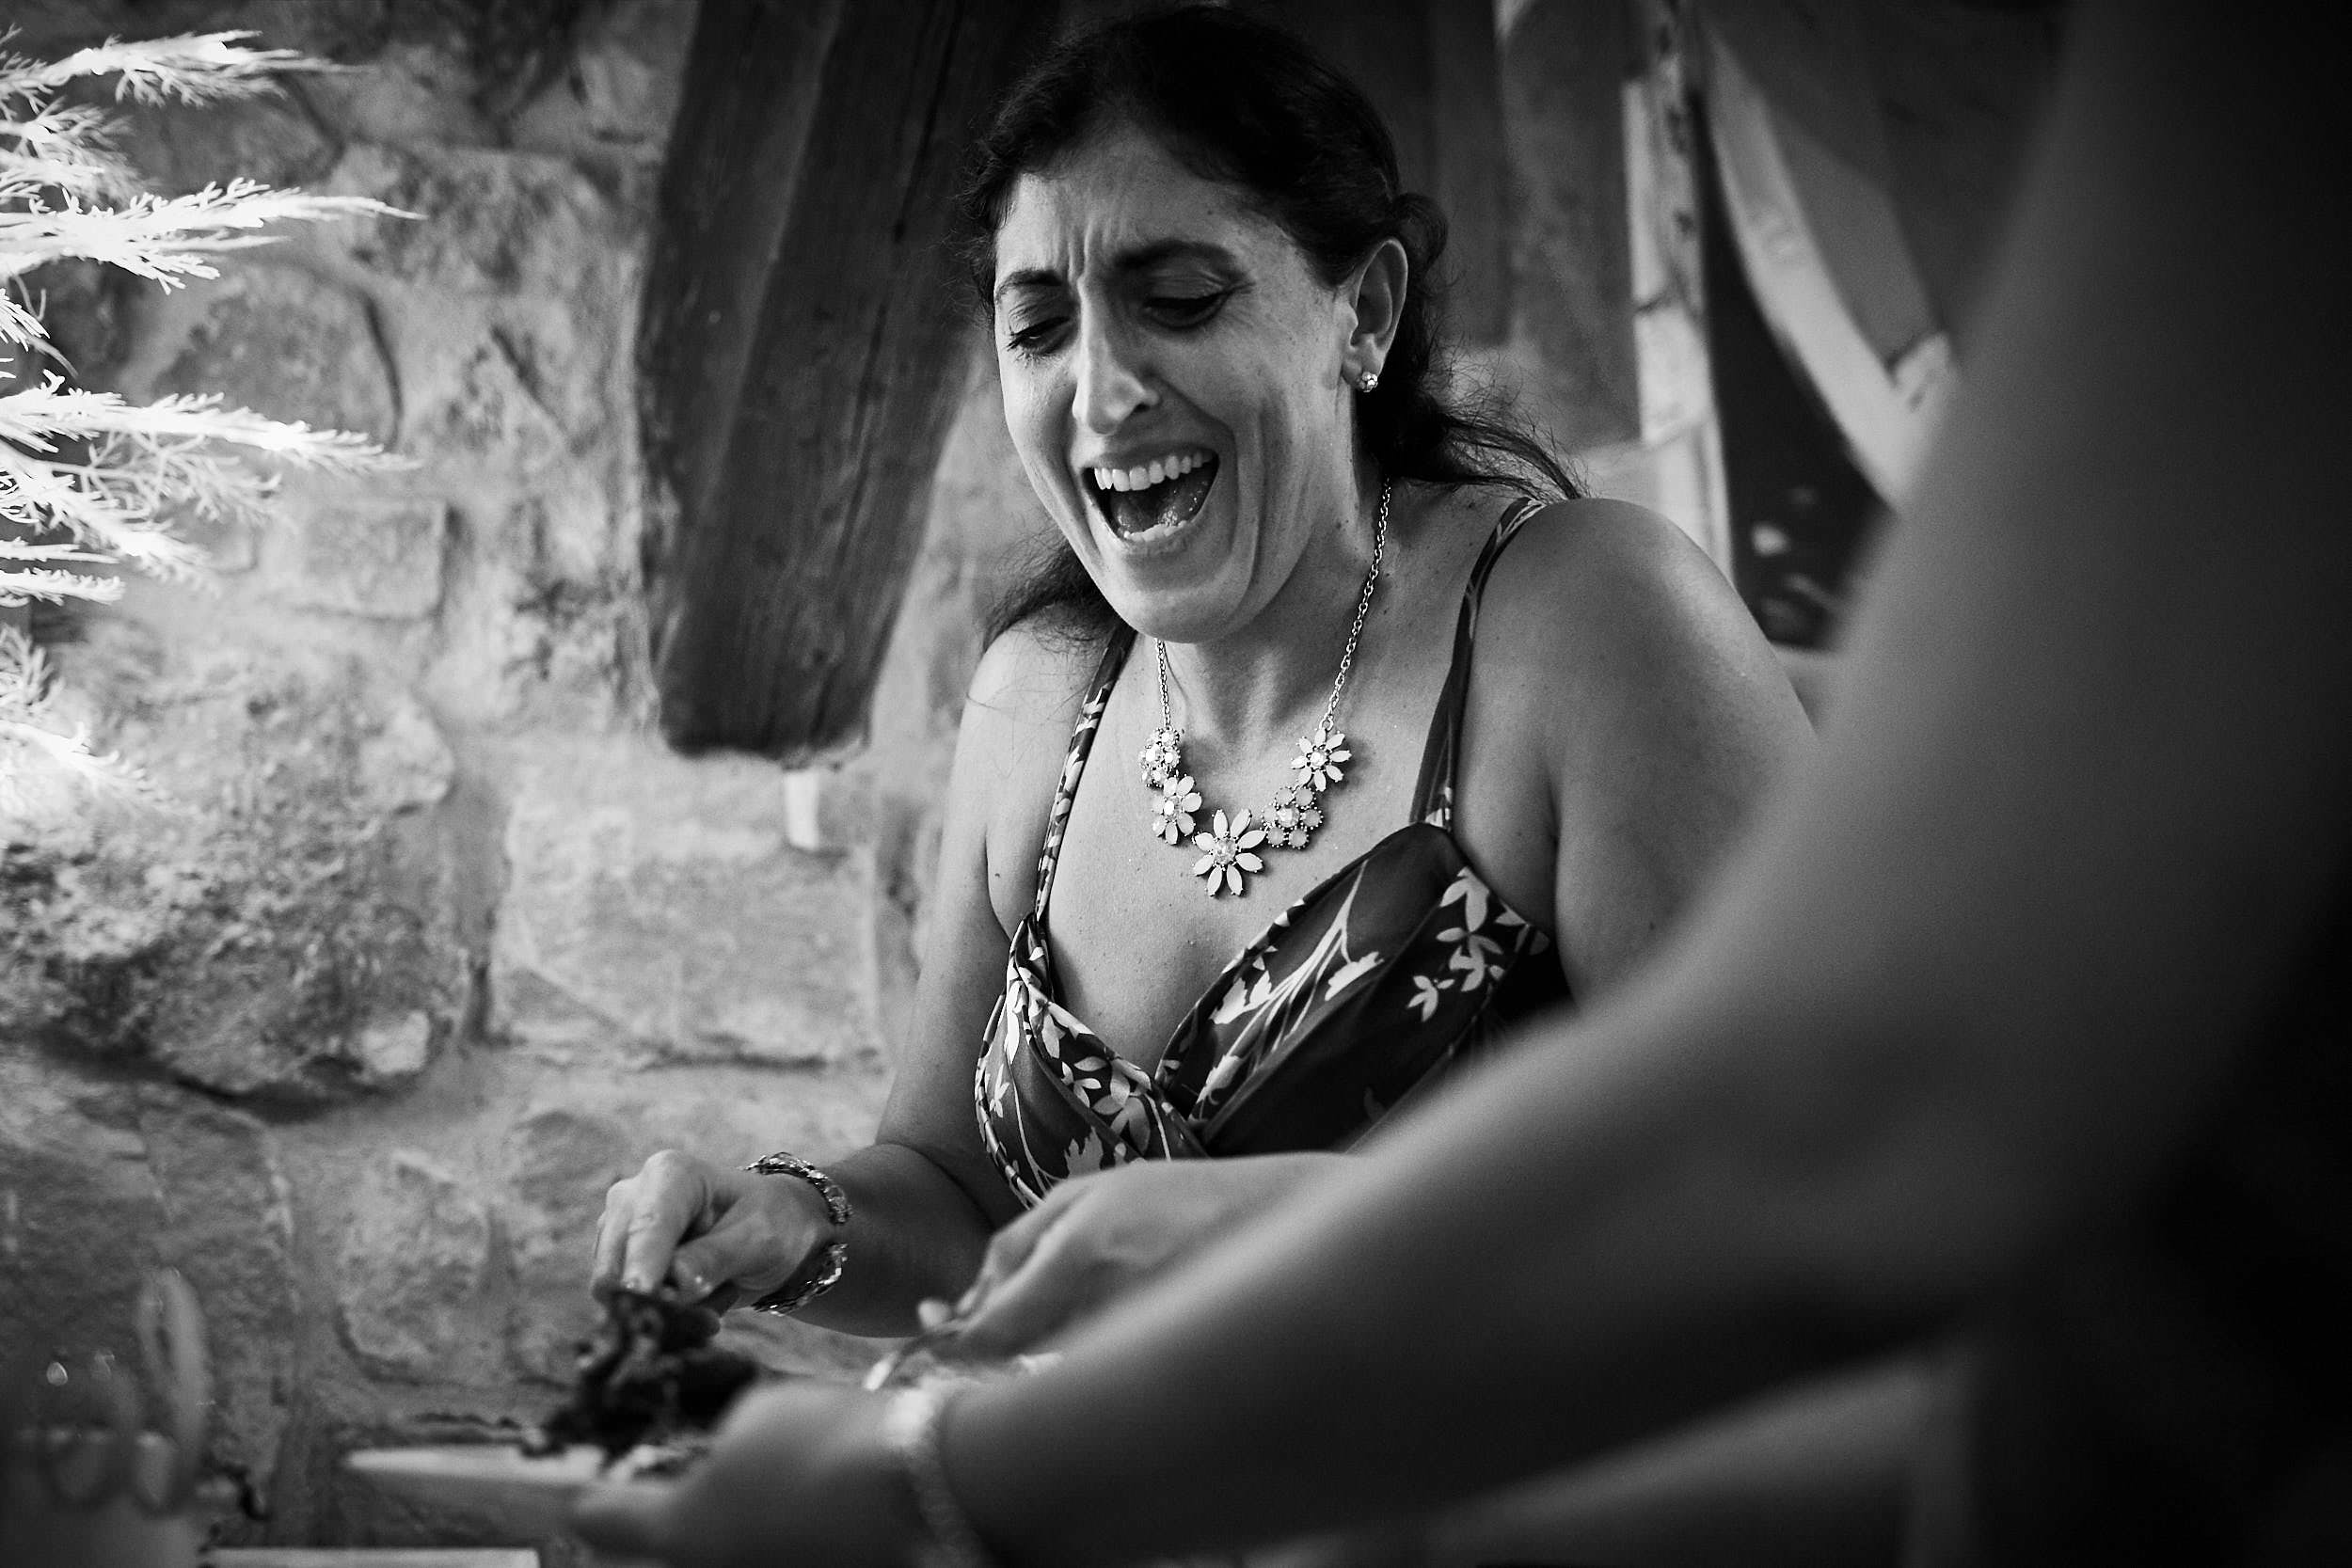 8/7/17 Evange & Juanma, La Vieja Bodega, Casalarreina, La Rioja, España. Photo by James Sturcke   sturcke.org